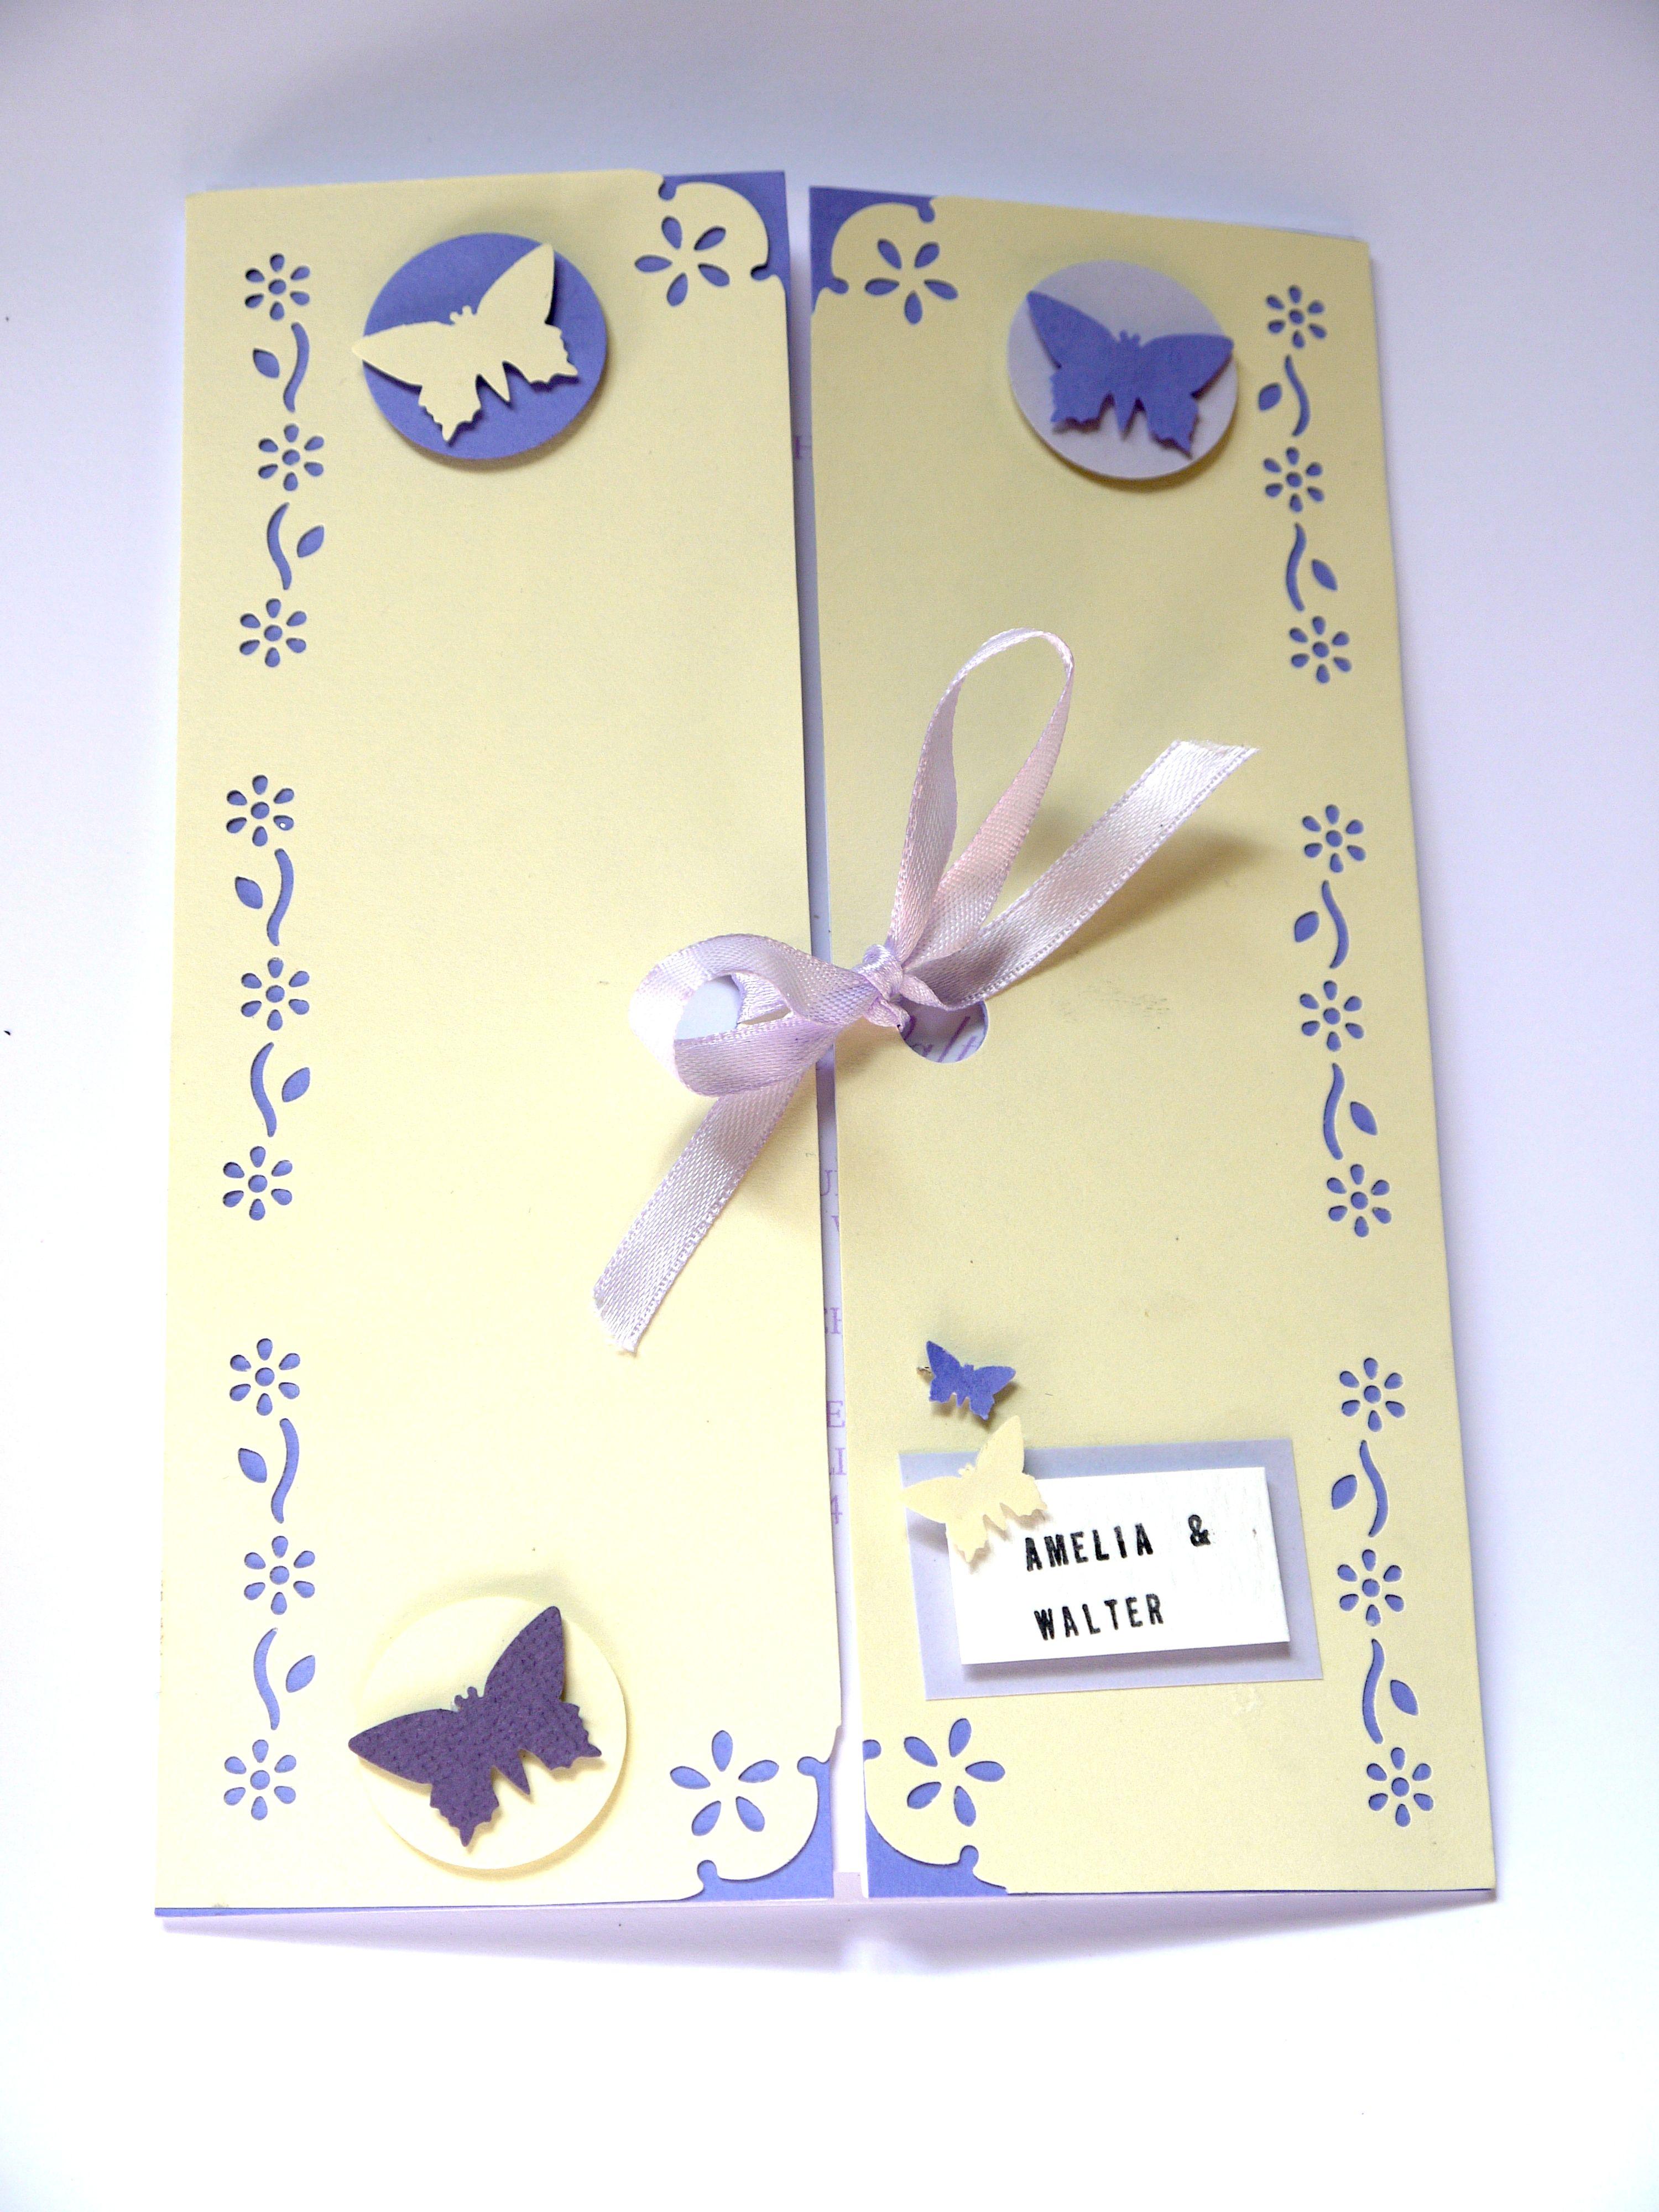 Design 4 wedding invitations kerry anne pinterest design 4 monicamarmolfo Image collections